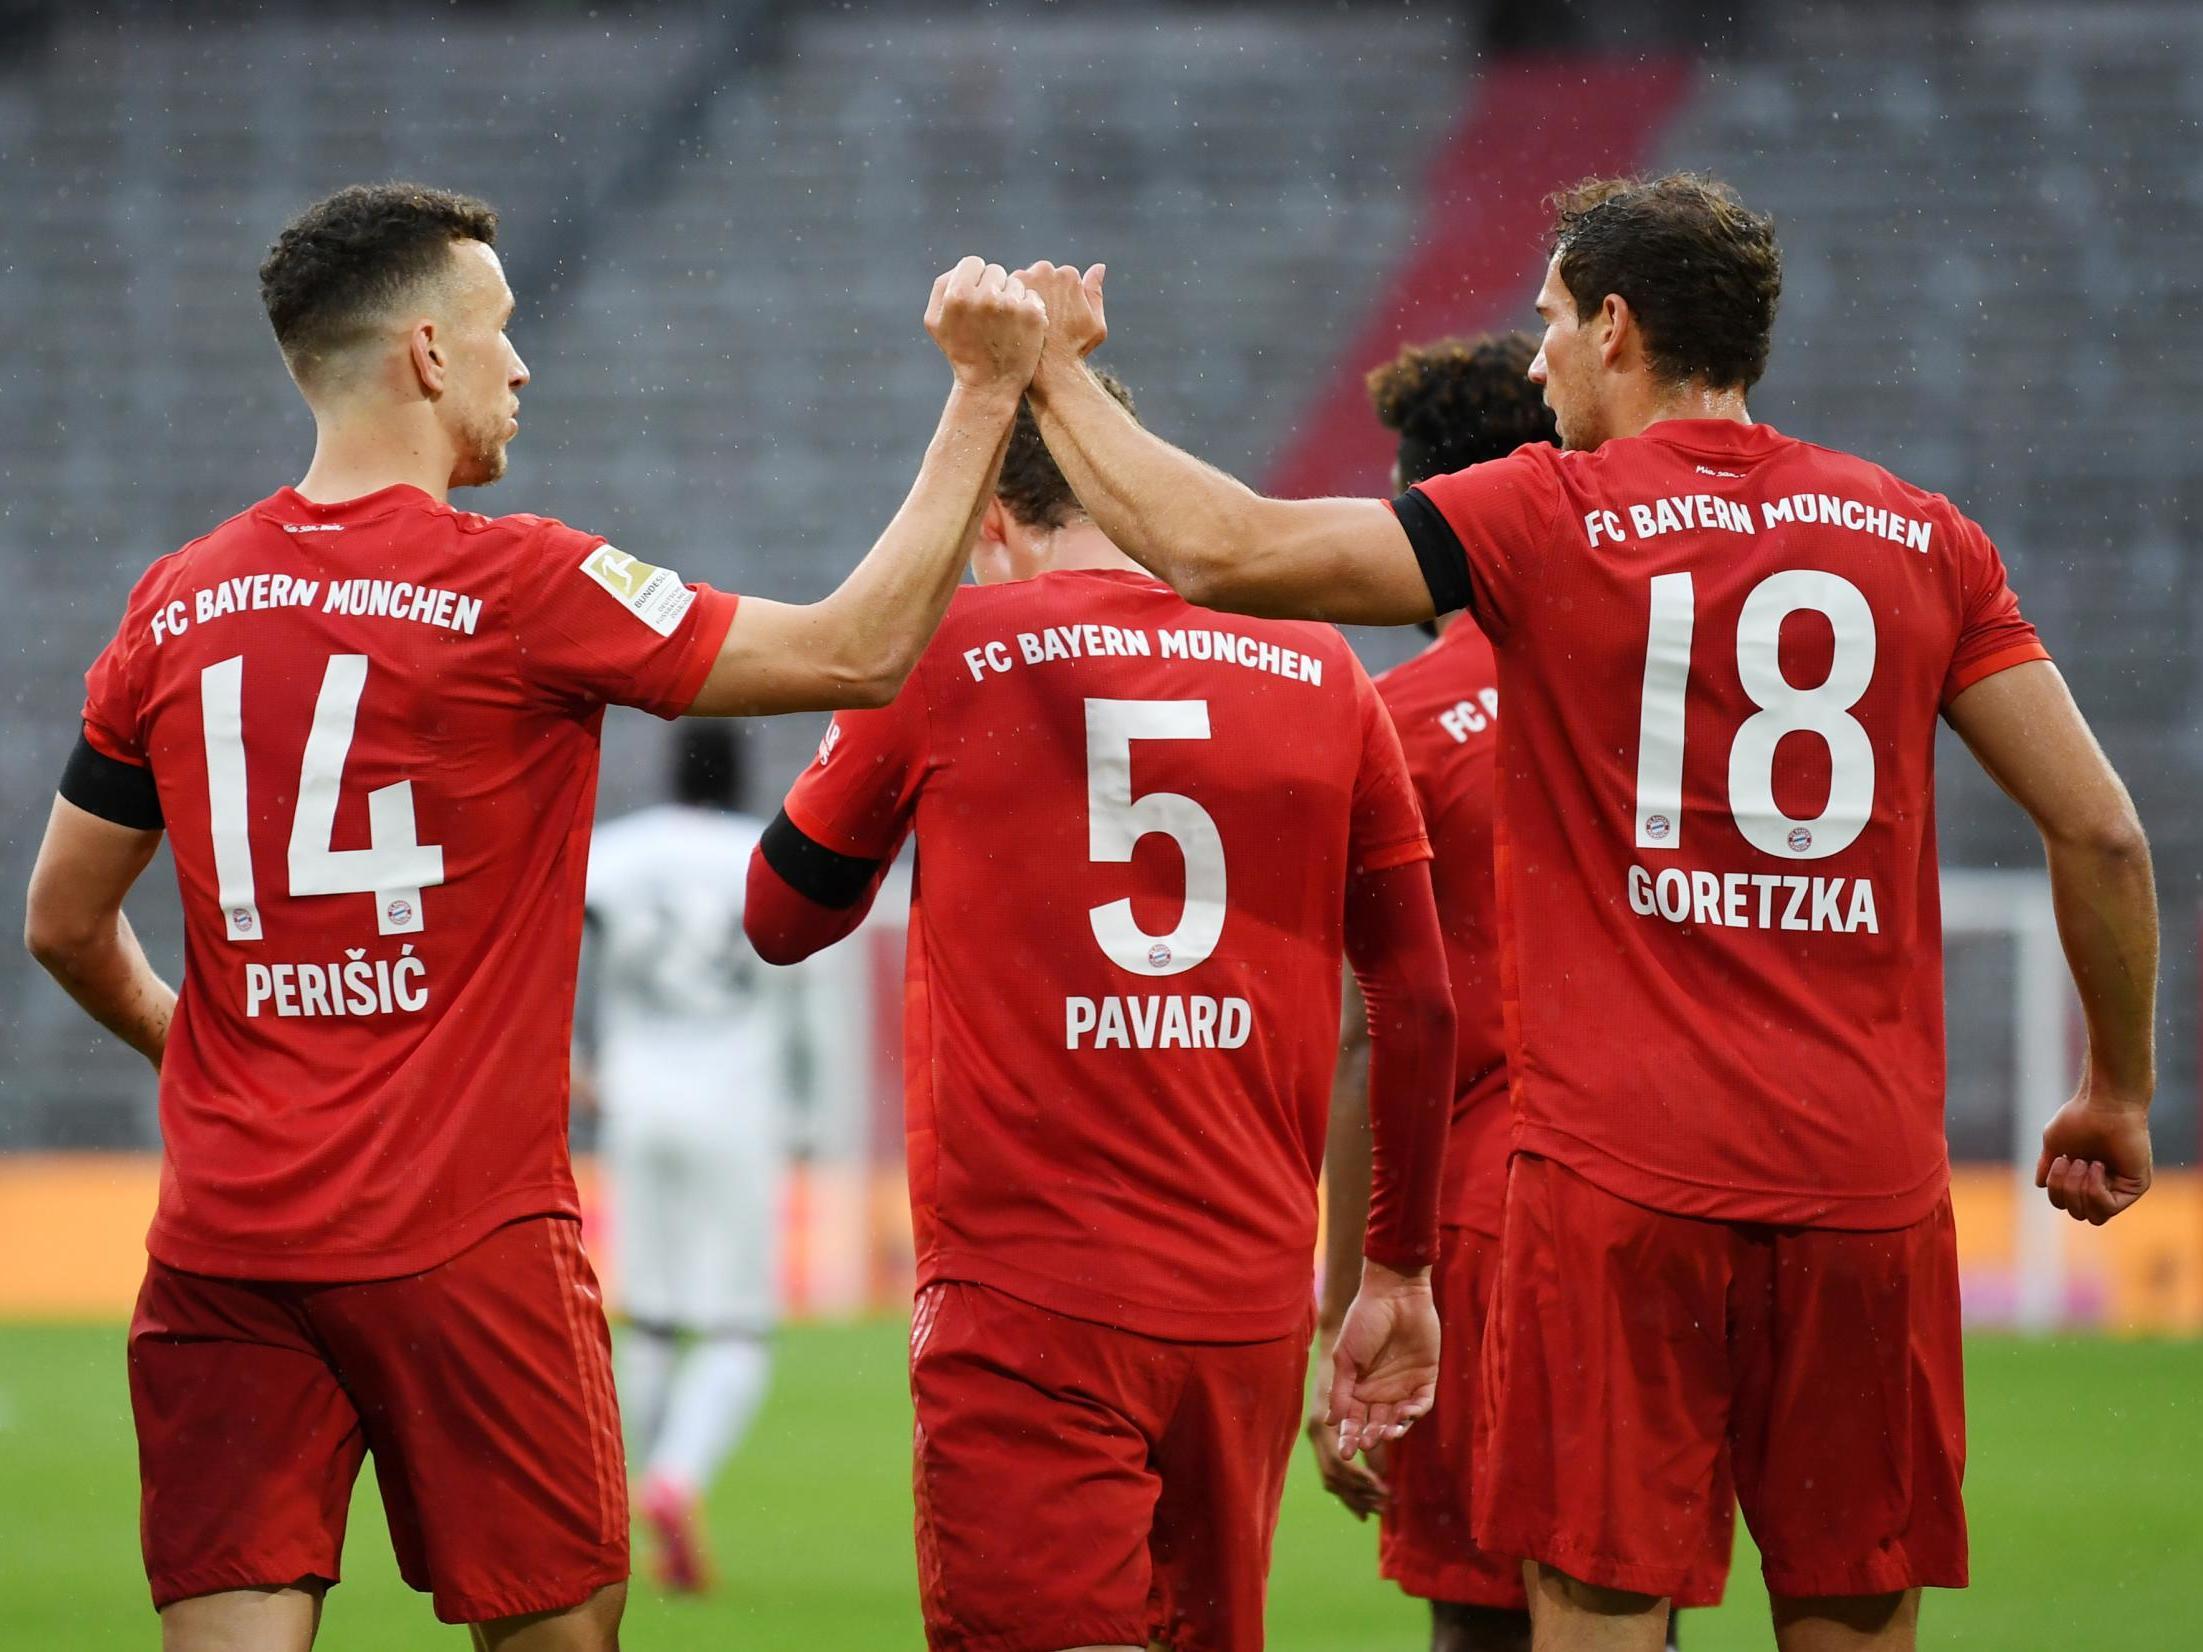 Hasil Bundesliga: 7 Gol Tercipta, Bayern Munchen Lumat Eintracht Frankfurt